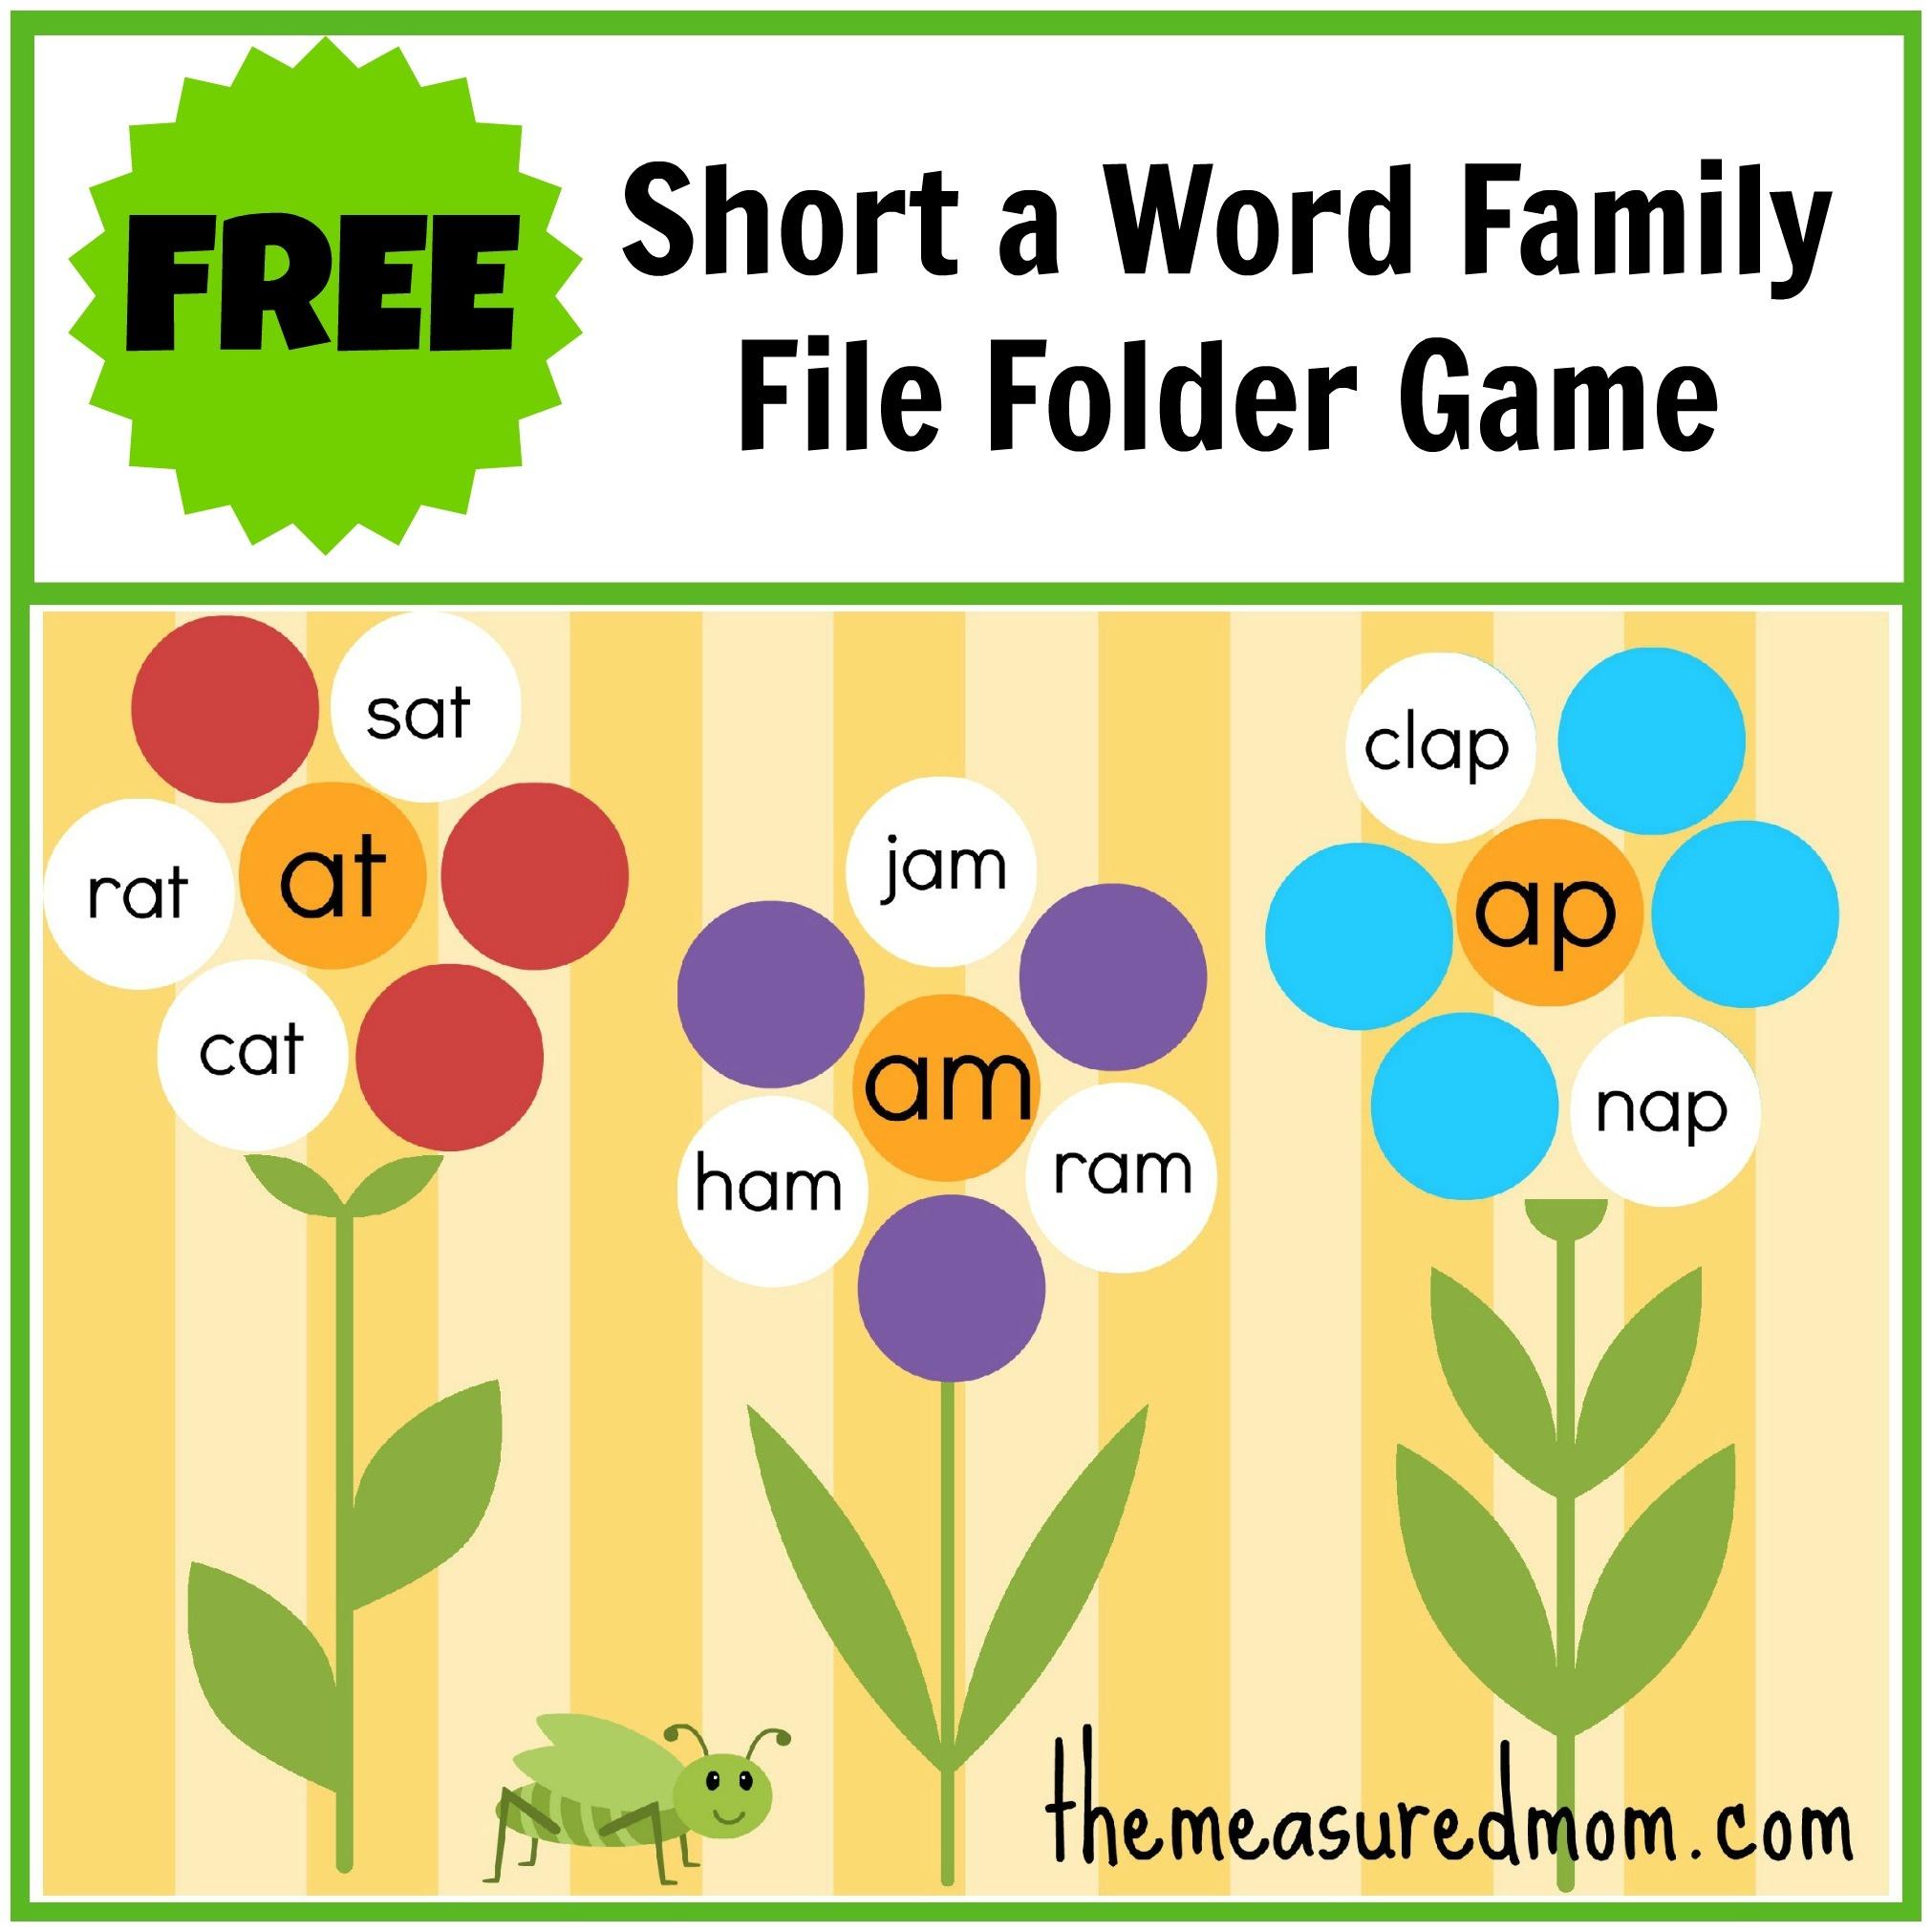 Free Word Family File Folder Game: Short A - The Measured Mom - Free Printable File Folder Games